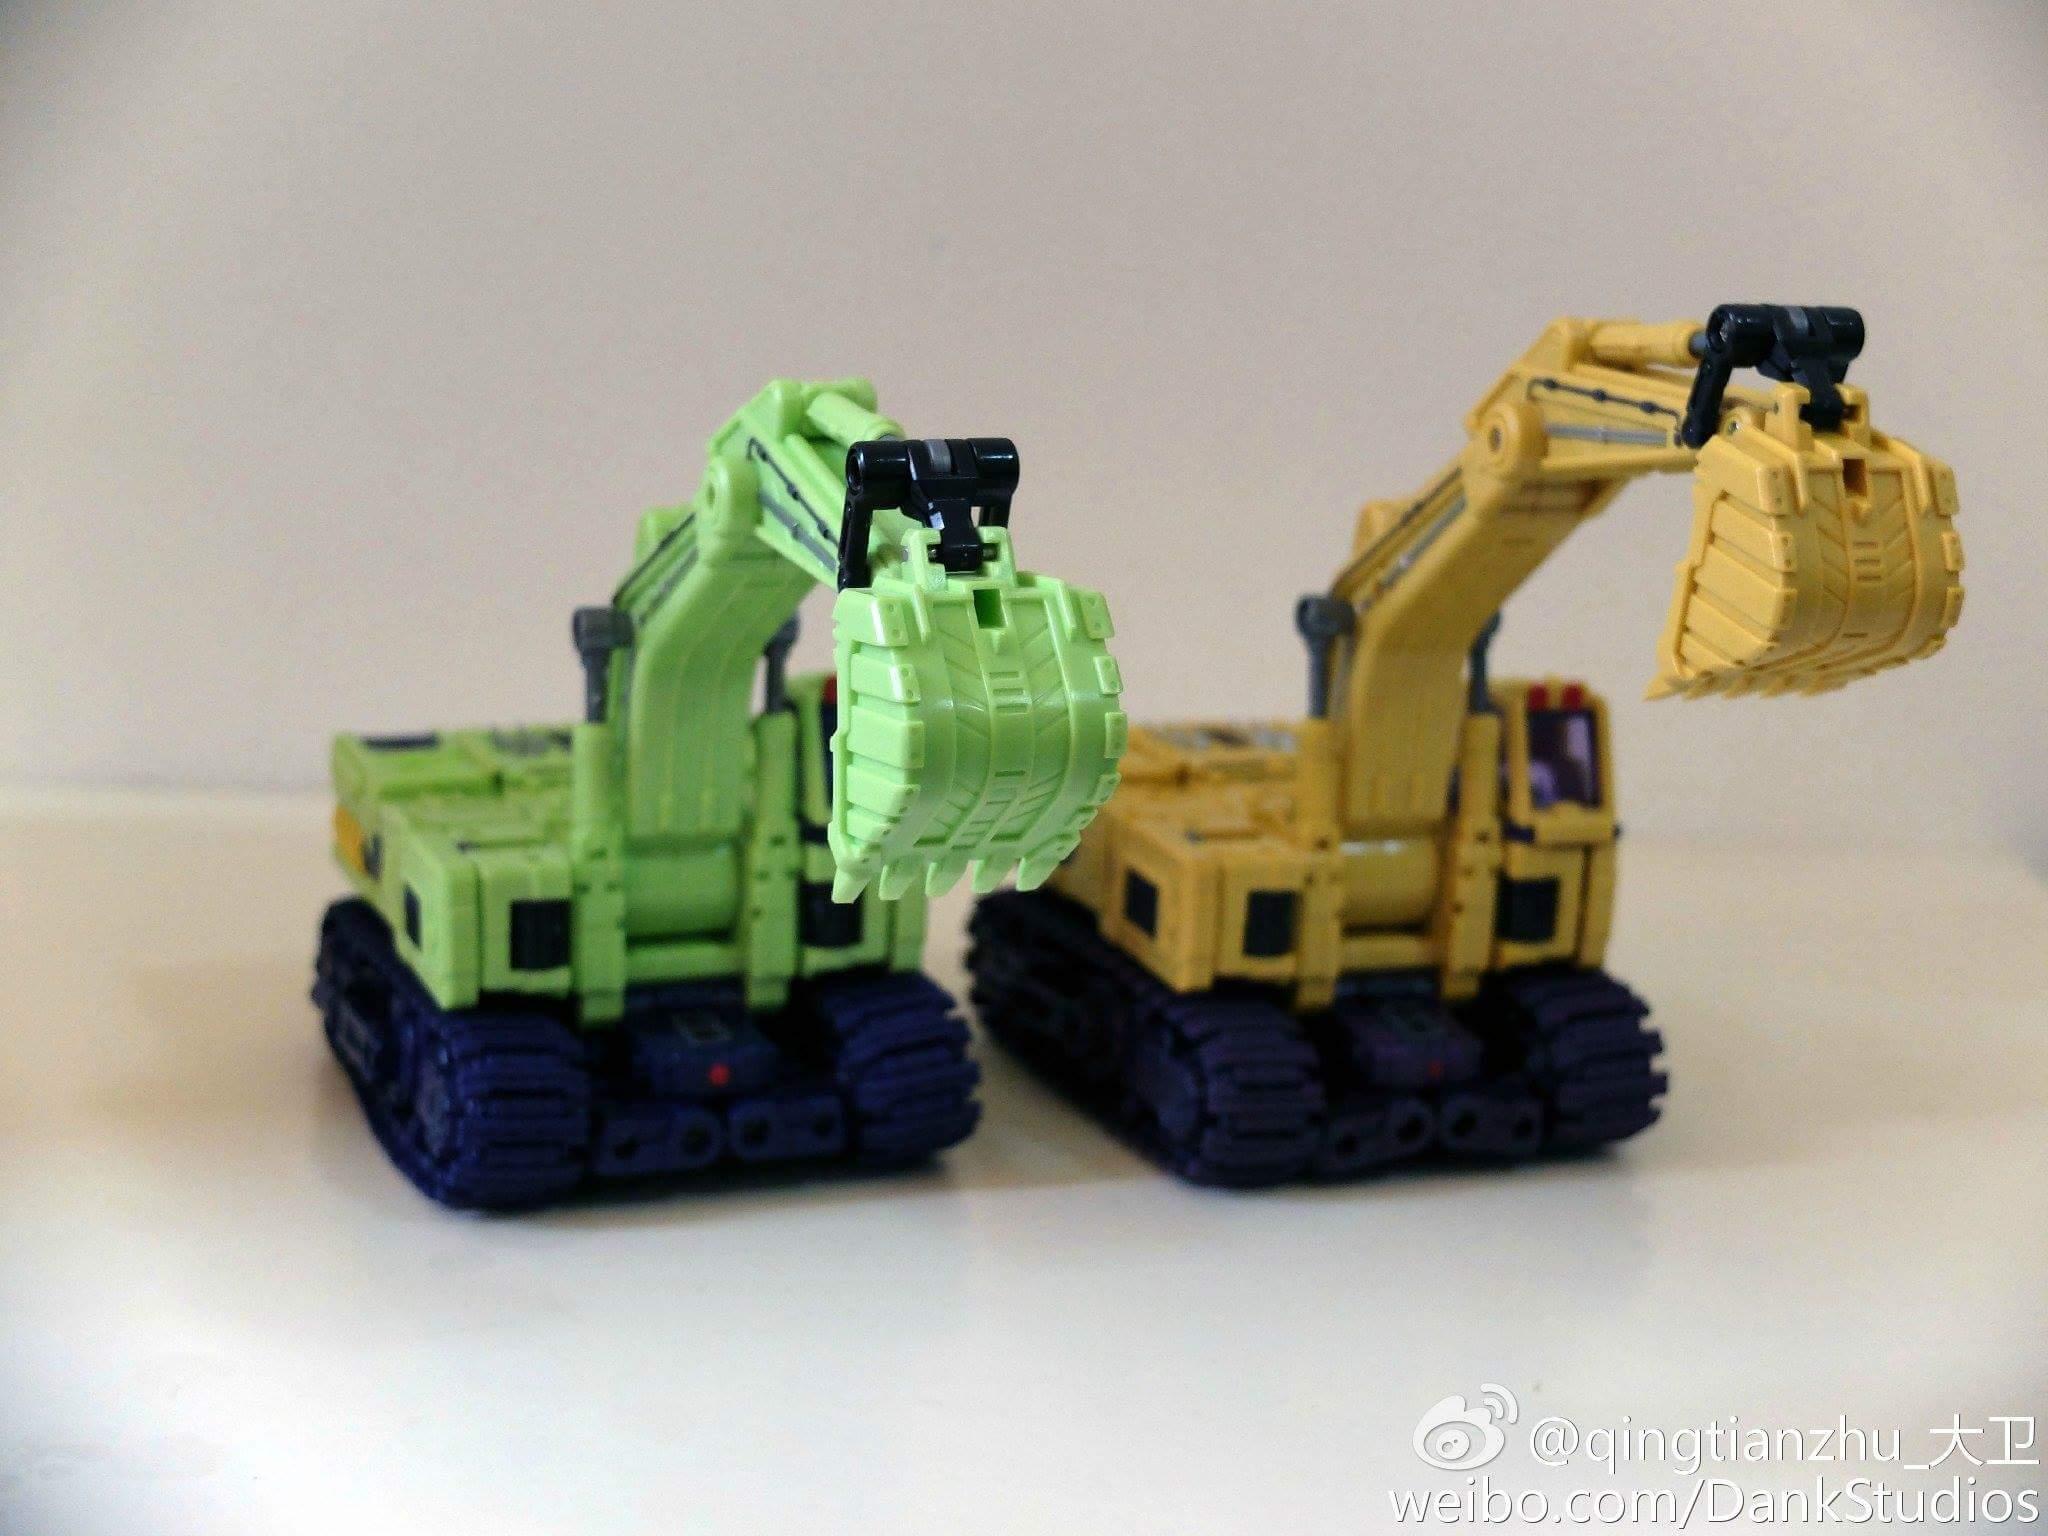 [Toyworld] Produit Tiers - Jouet TW-C Constructor aka Devastator/Dévastateur (Version vert G1 et jaune G2) - Page 8 Ez63jPm2